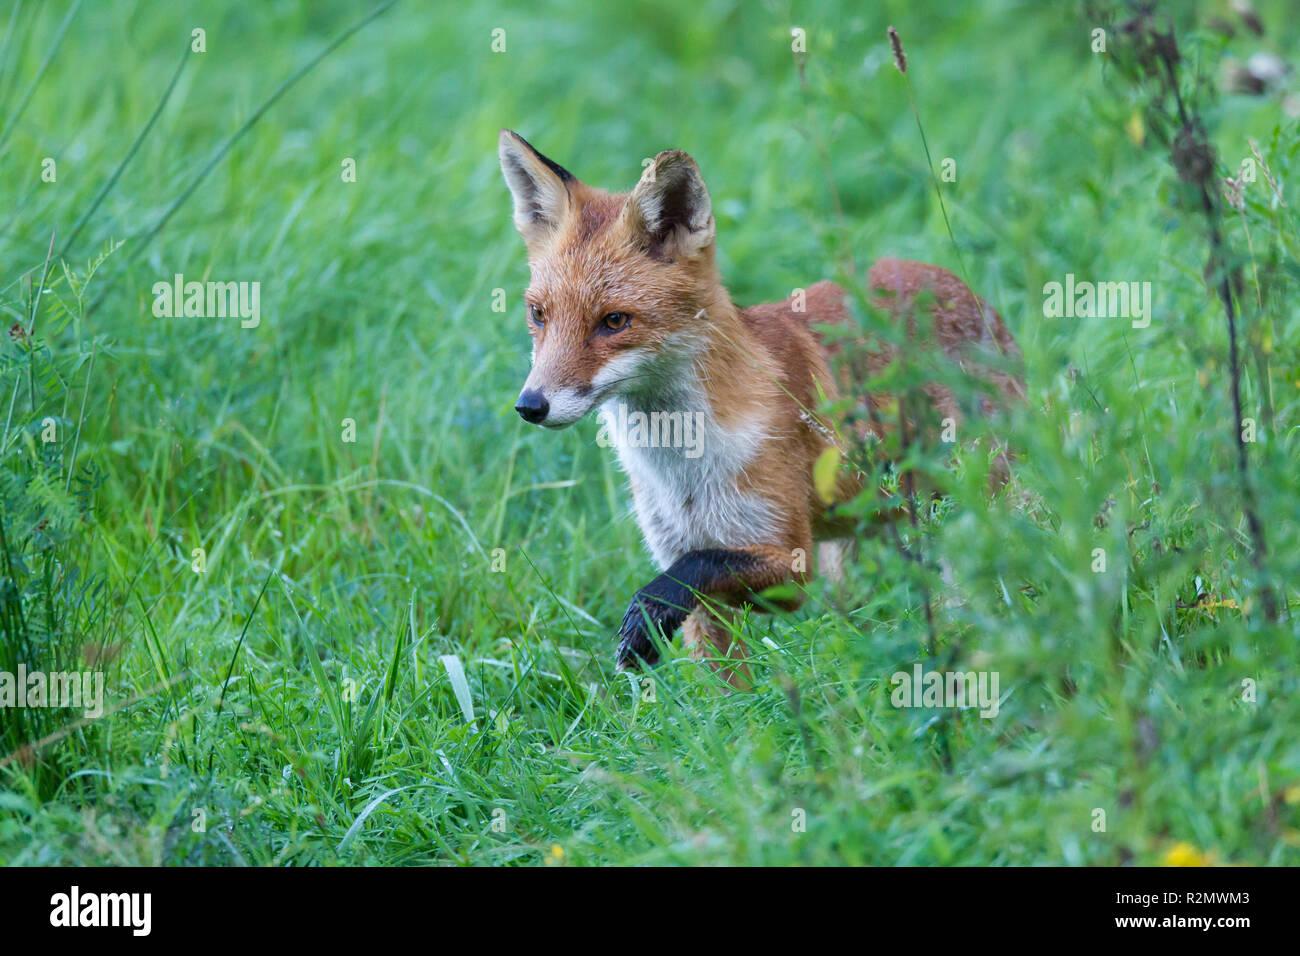 Fox on the hunt - Stock Image